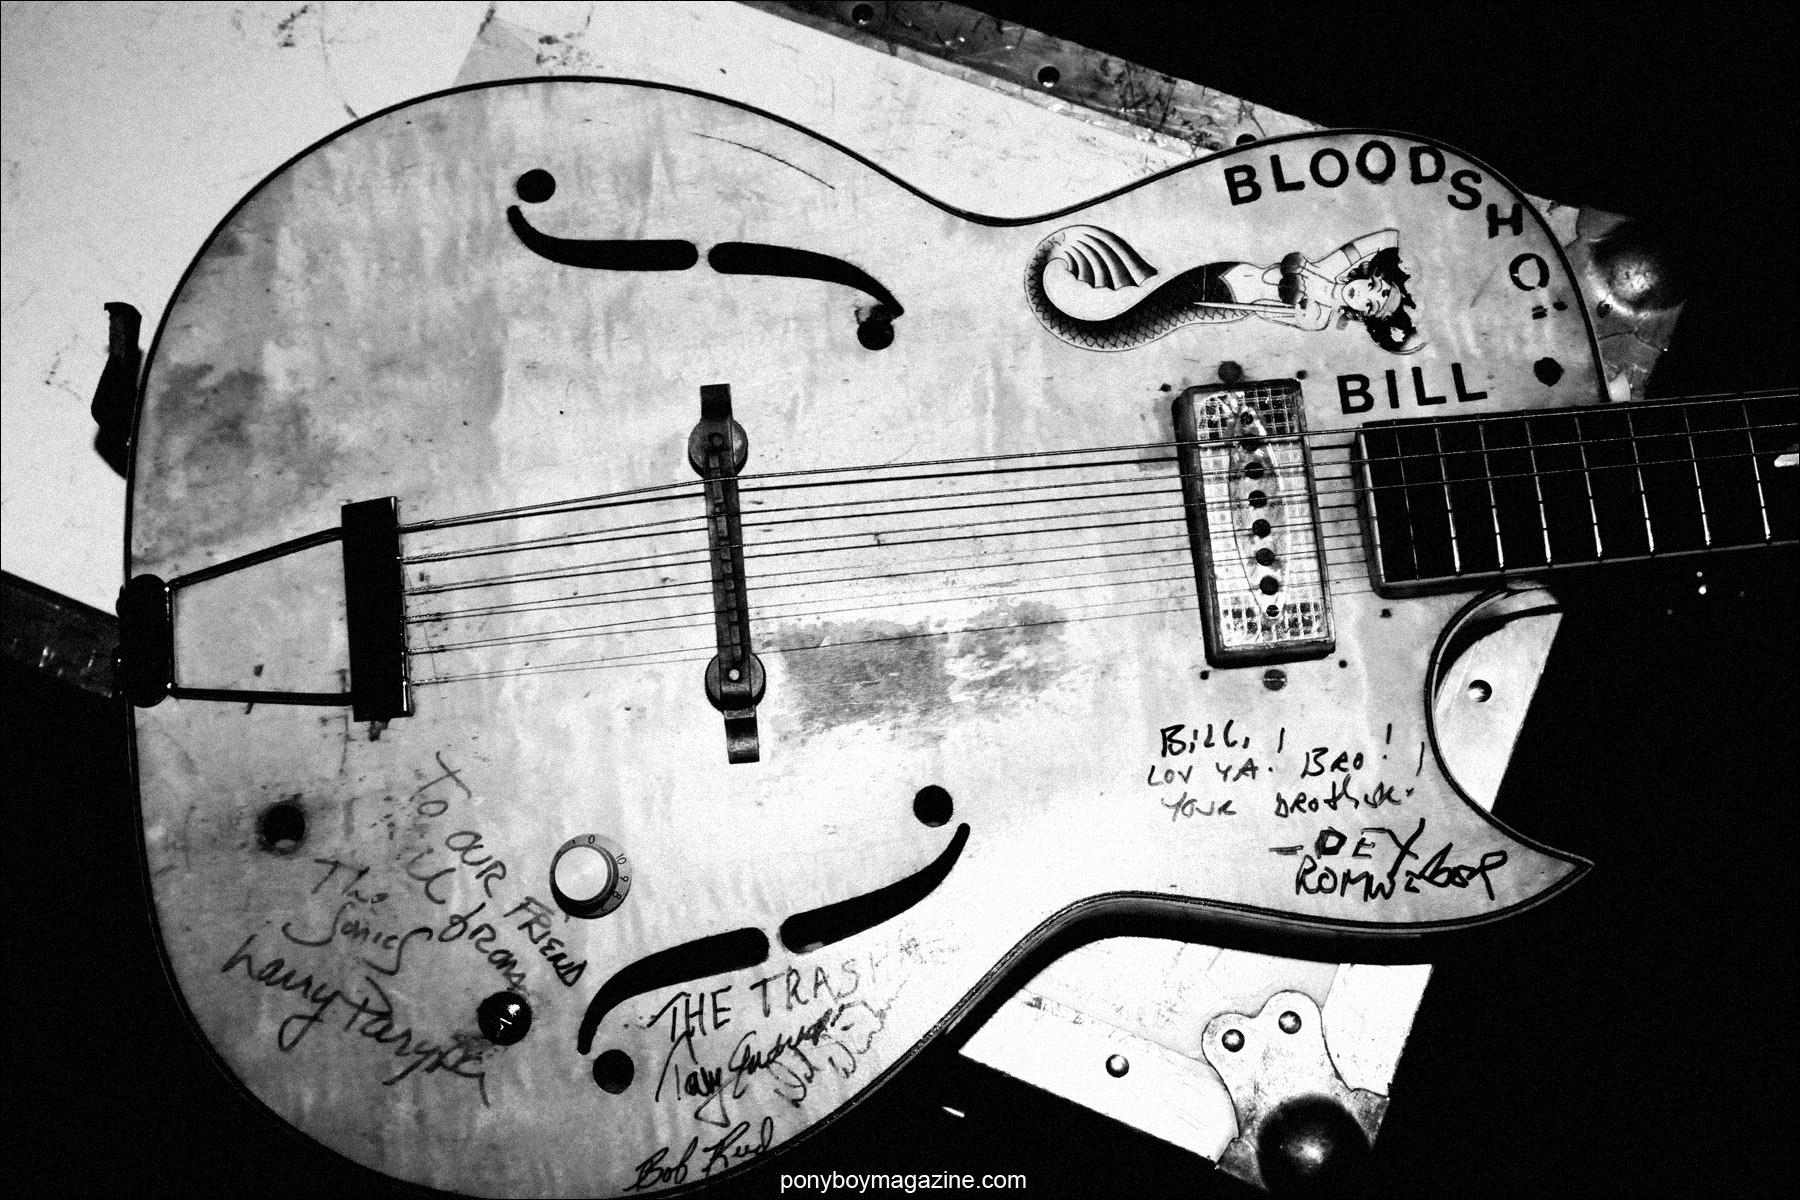 Photograph of Bloodshot Bill guitar by Alexander Thompson for Ponyboy Magazine.